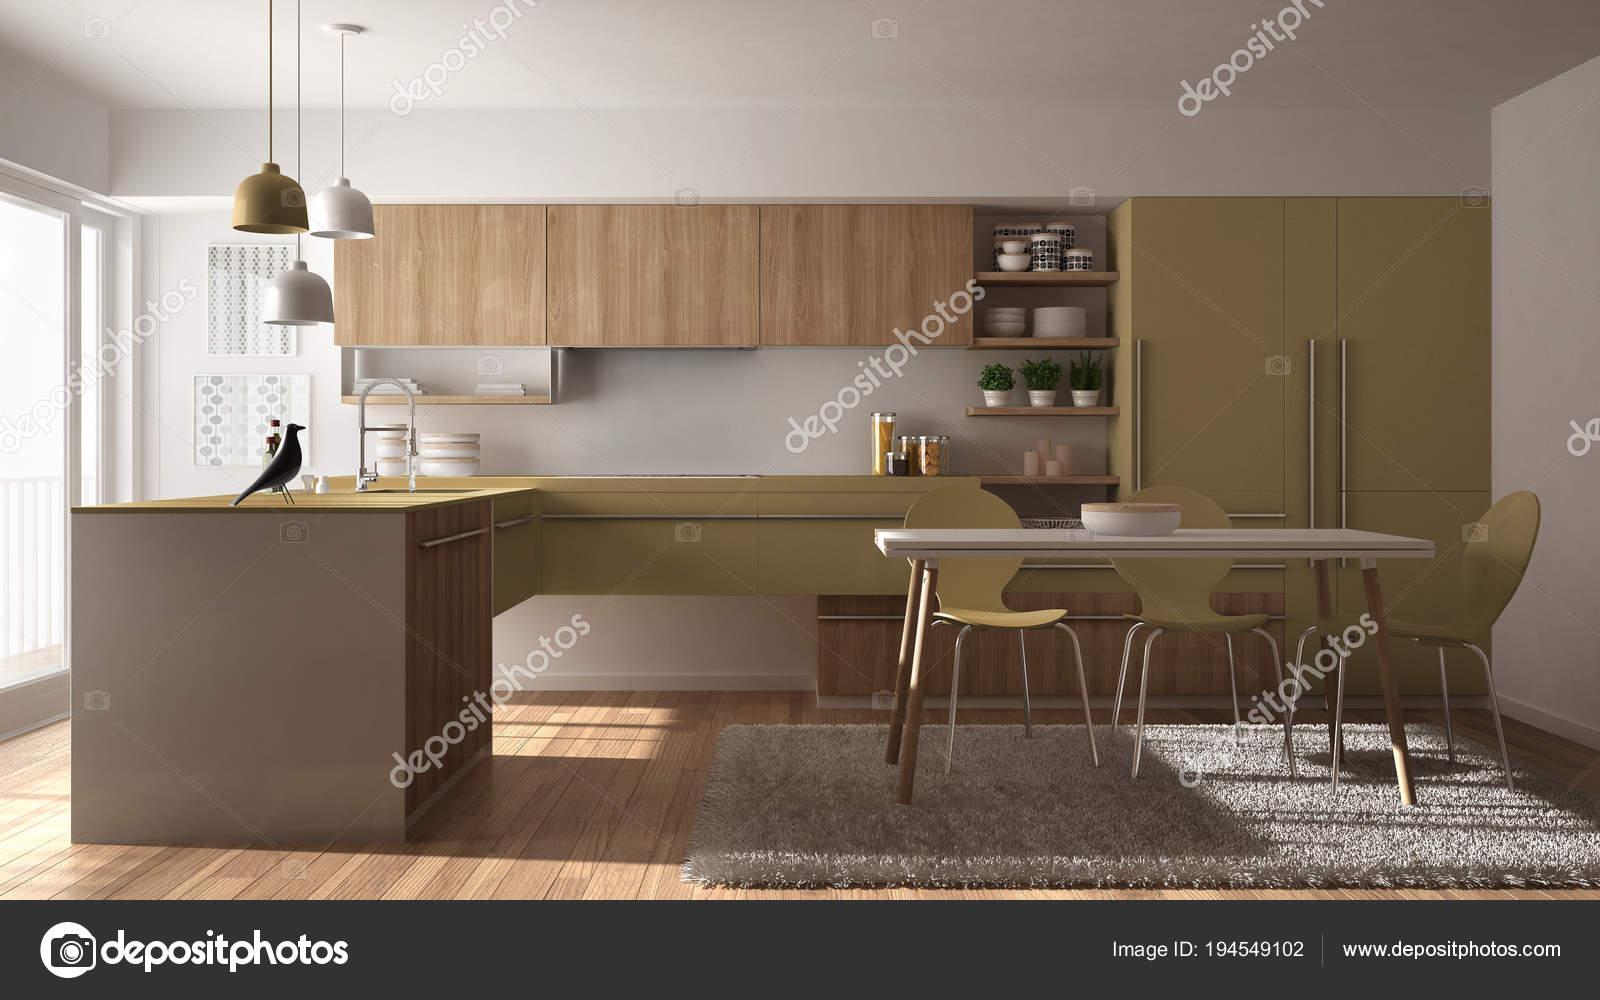 yellow kitchen rugs glass tiles for backsplash 现代简约木制厨房配有餐桌 地毯和全景窗 白色和黄色建筑内饰设计 图库 照片作者archiviz